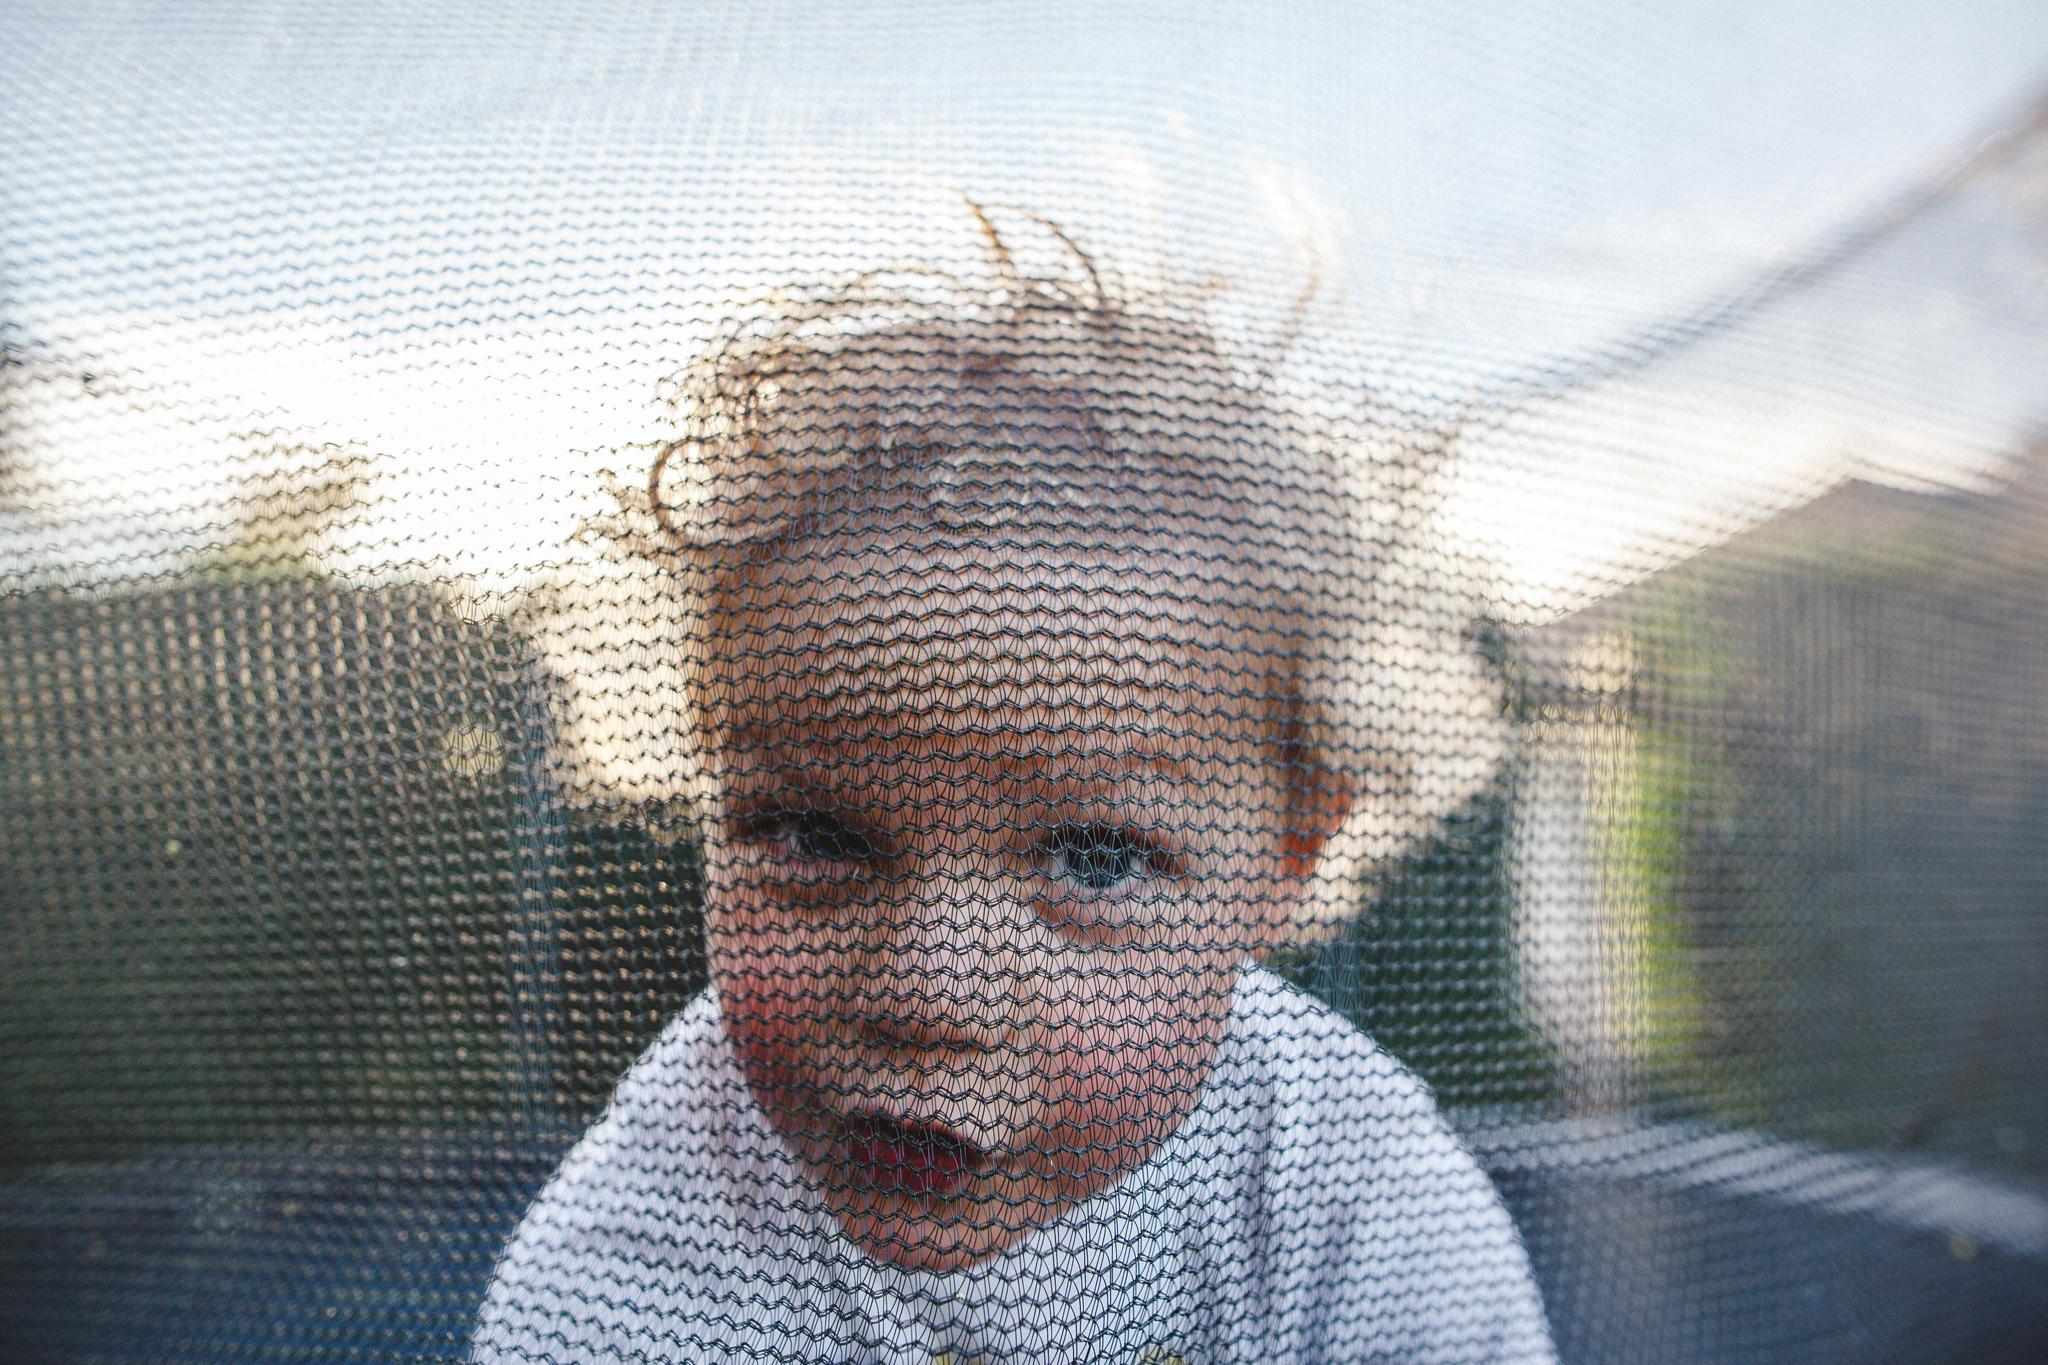 sullivan silly face trampoline-1.jpg